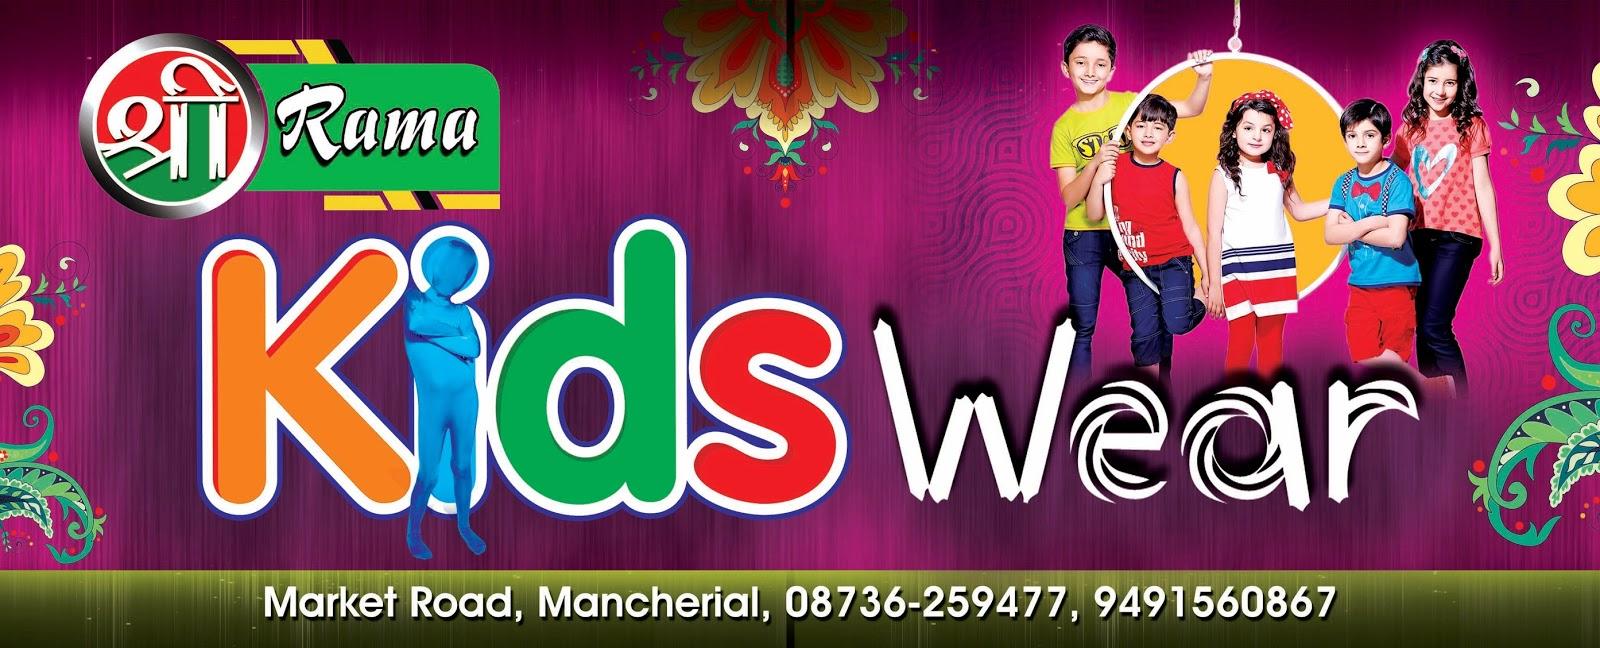 Kids Wear Flex Banner Design Psd Template Free Download